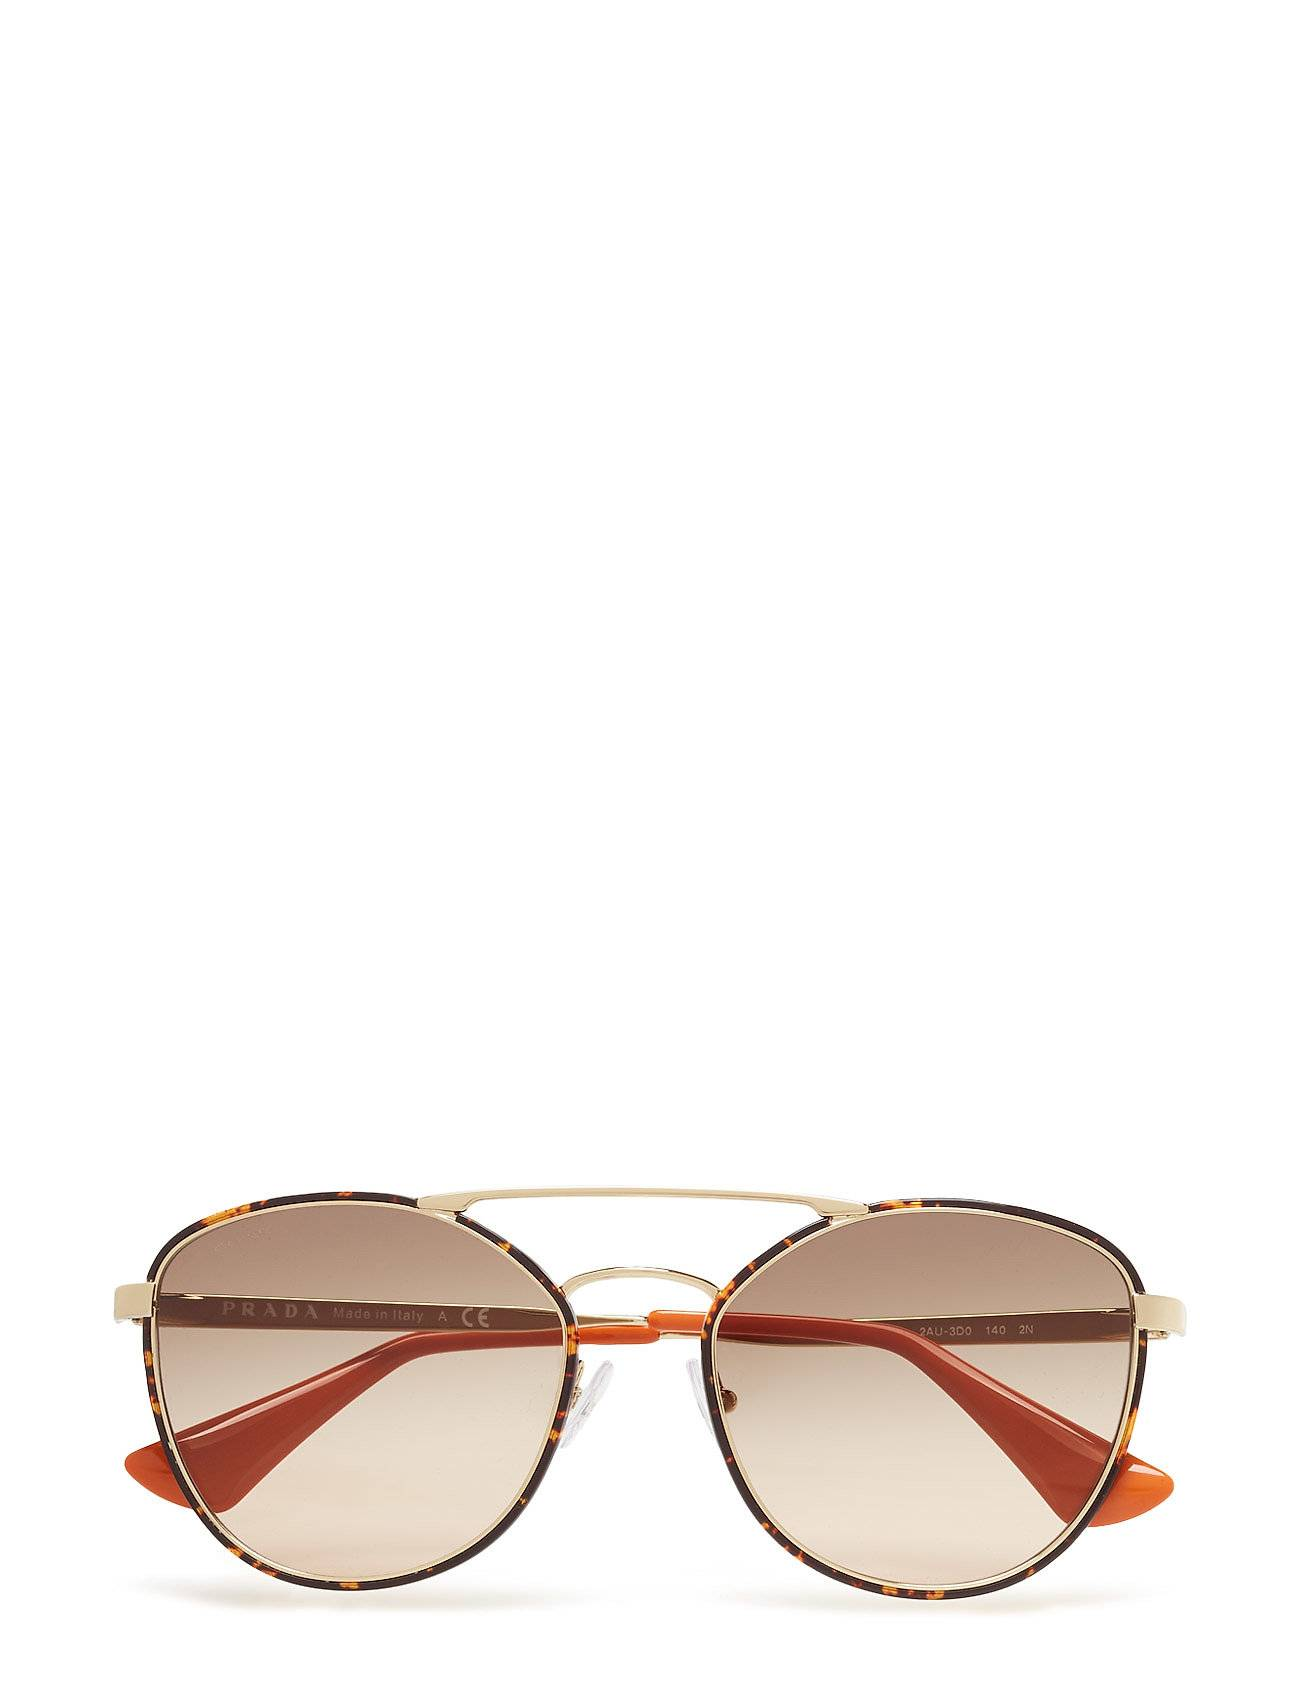 Image of Prada Sunglasses Not Defined Aurinkolasit Ruskea Prada Sunglasses